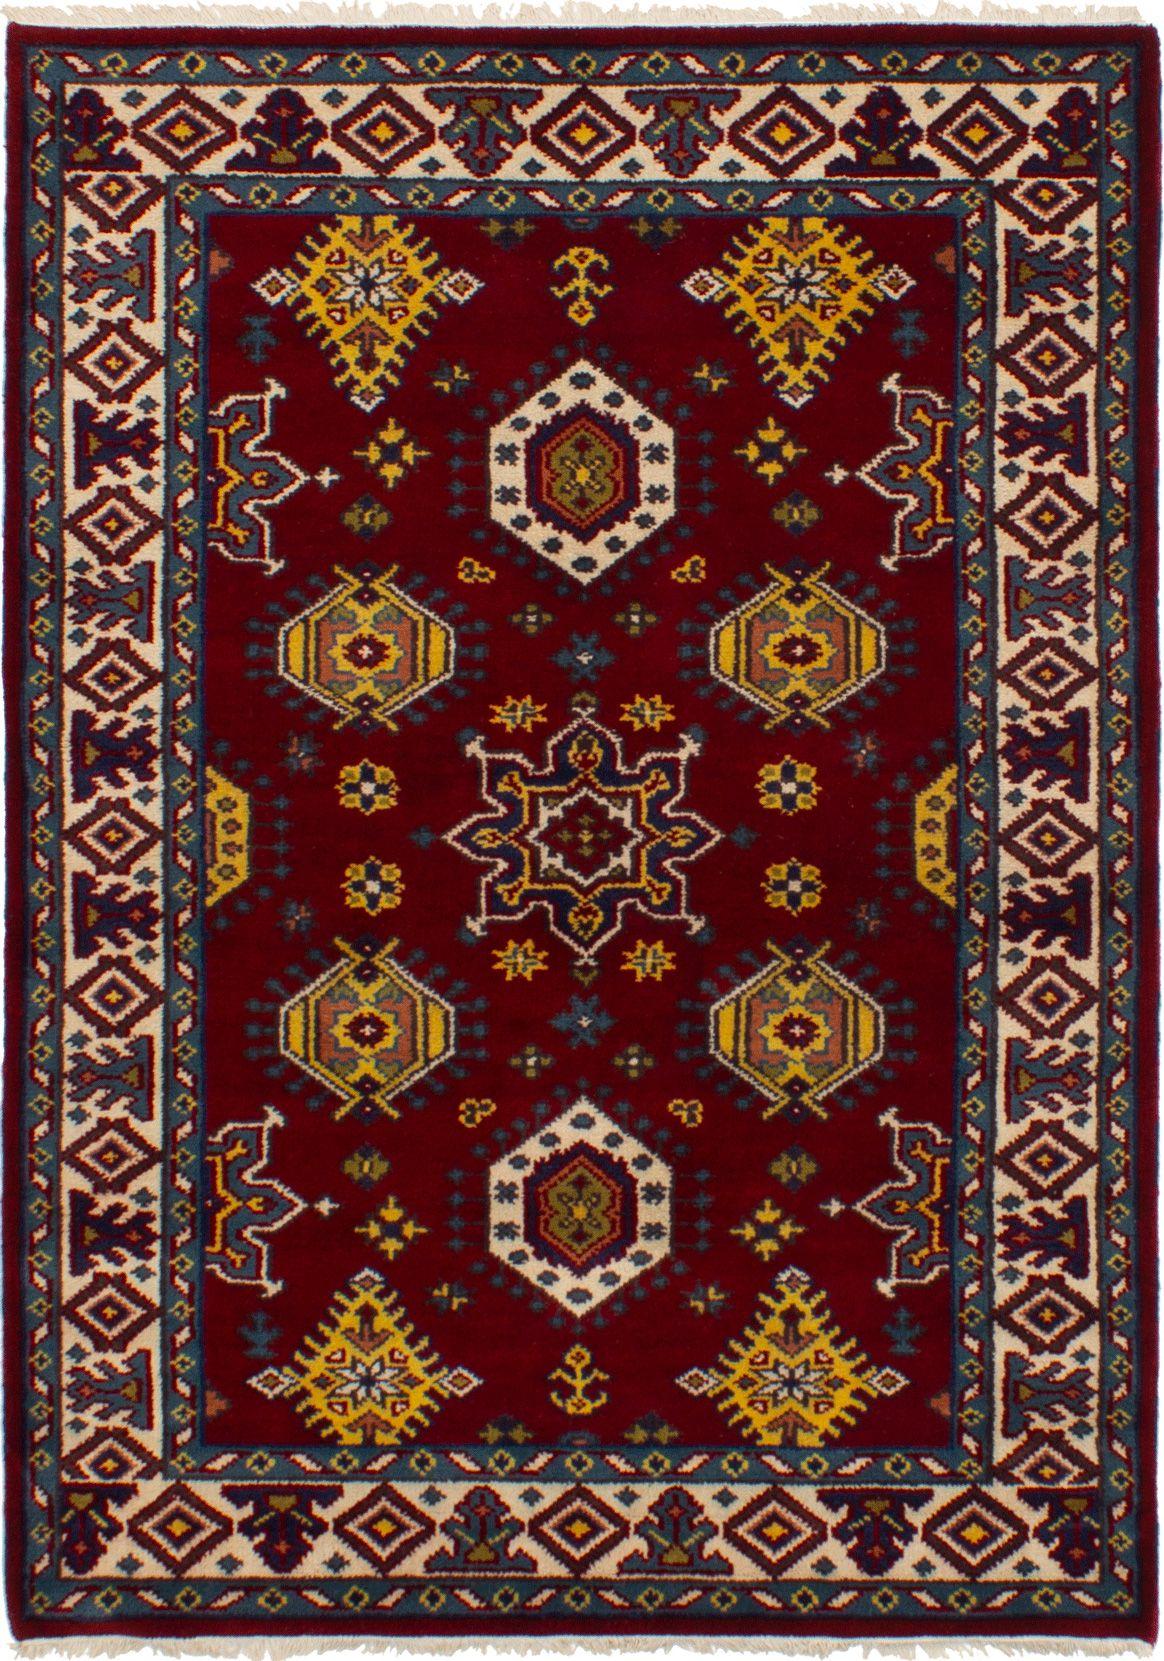 "Hand-knotted Royal Kazak Dark Red Wool Rug 4'9"" x 6'8""  Size: 4'9"" x 6'8"""